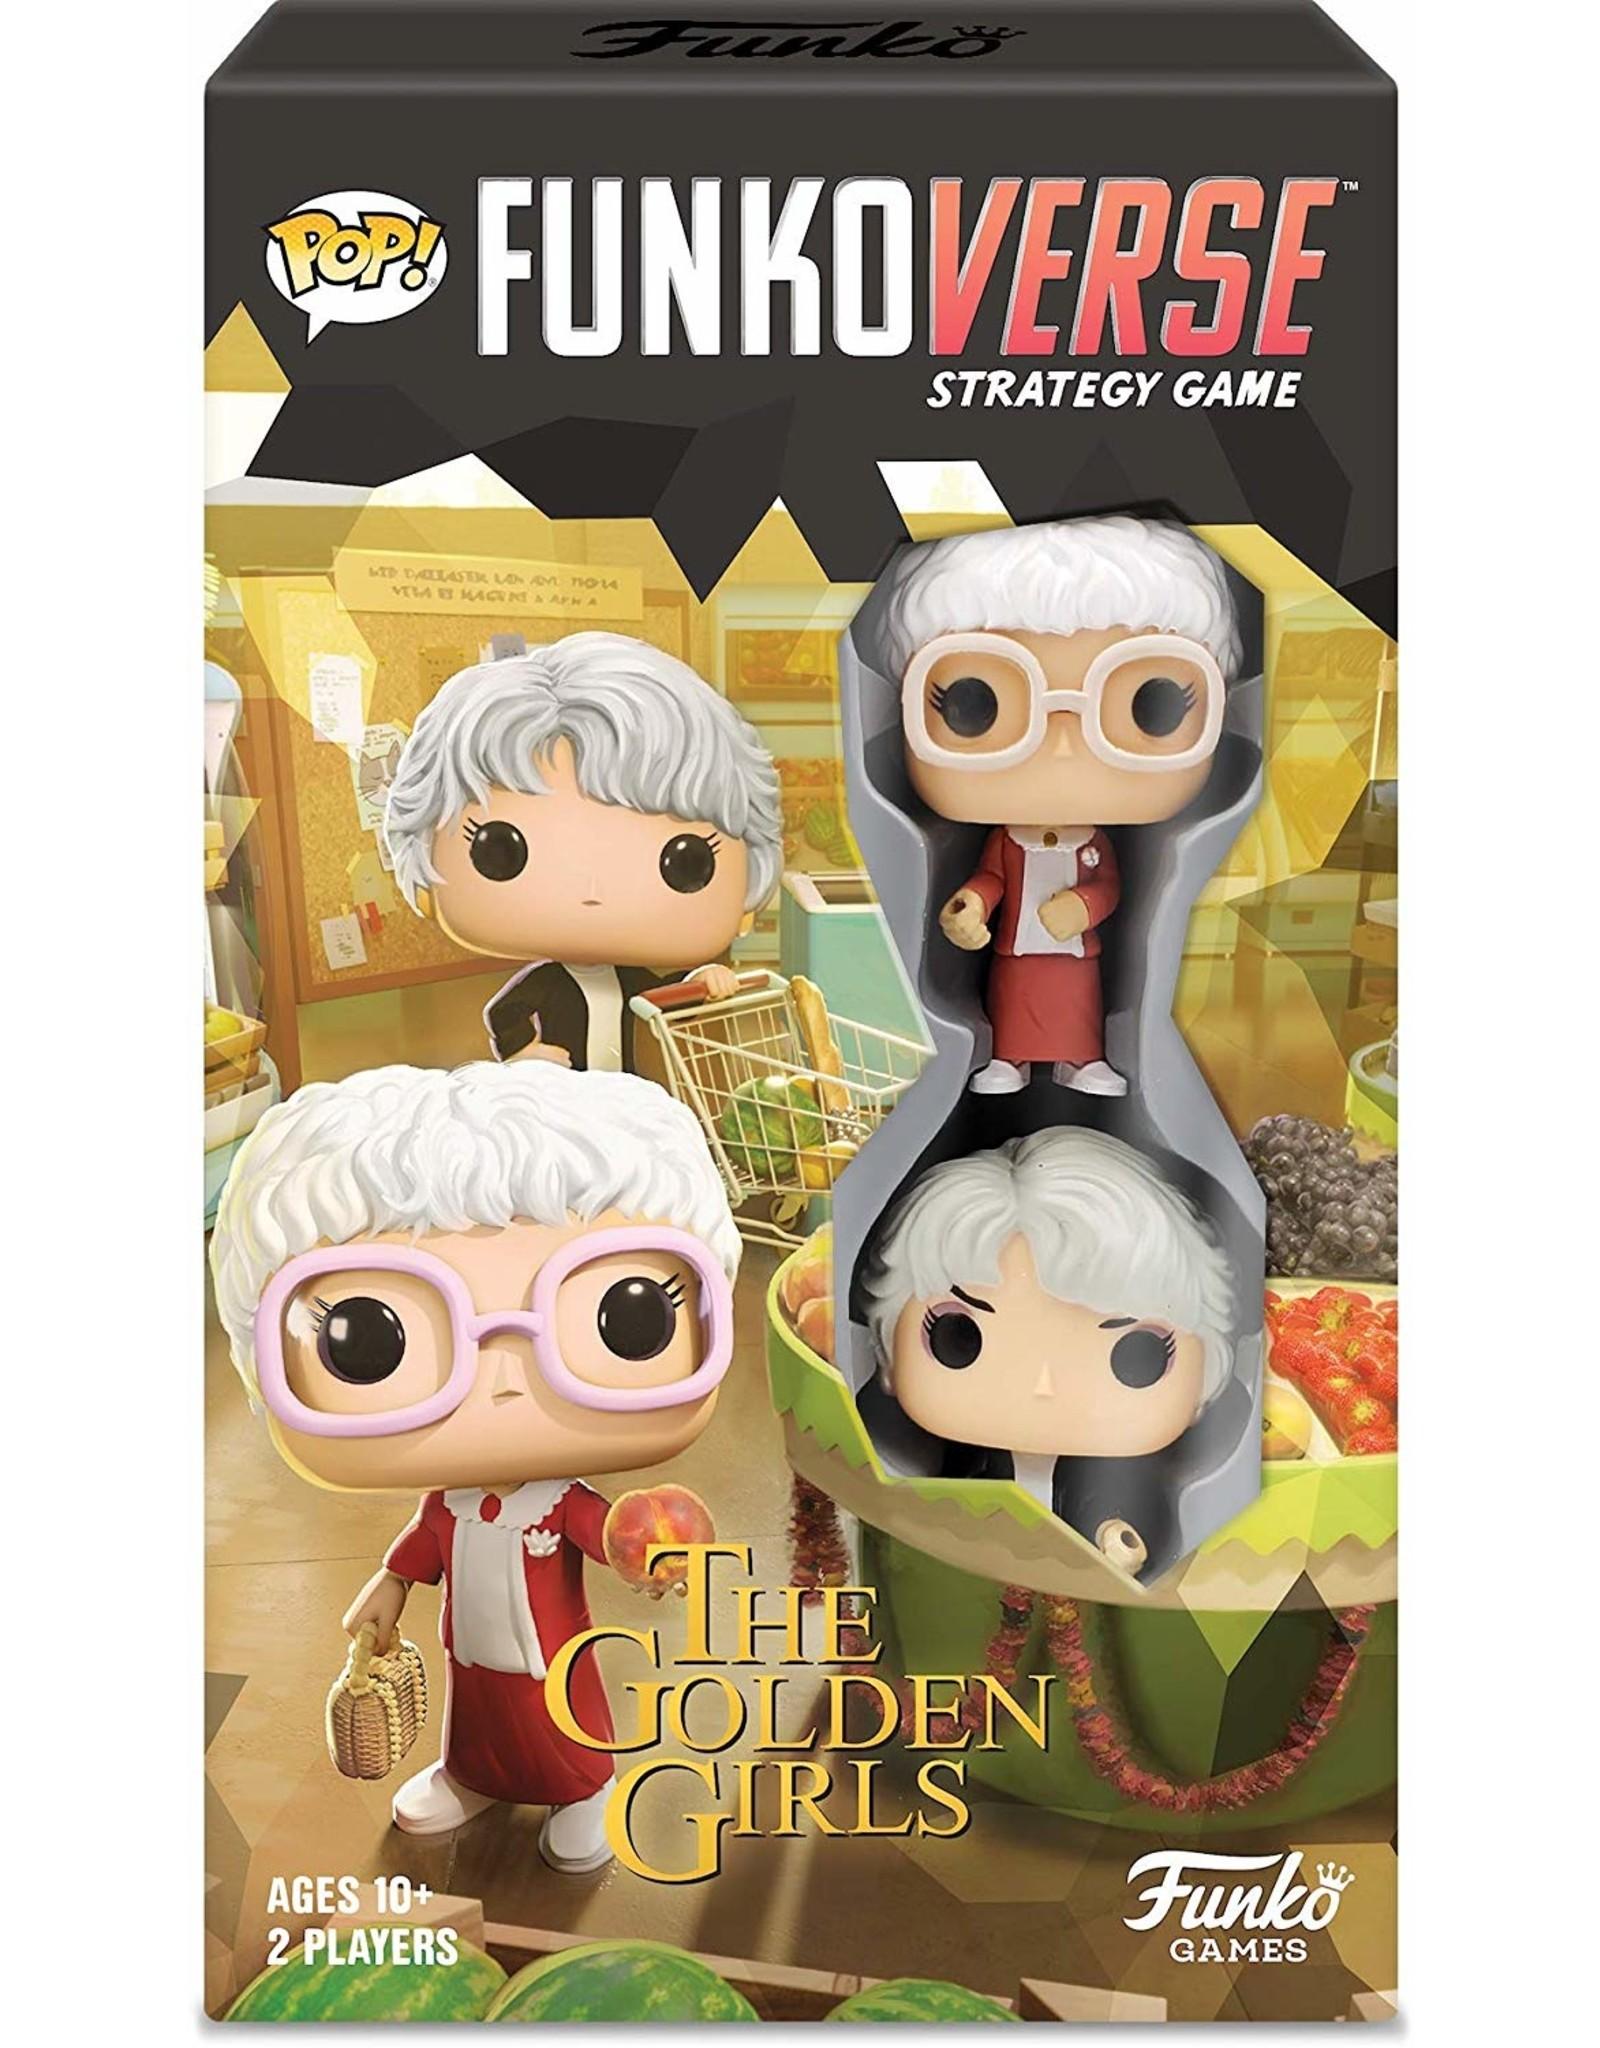 FUNKO POP! FUNKOVERSE STRATEGY GAME GOLDEN GIRLS 101